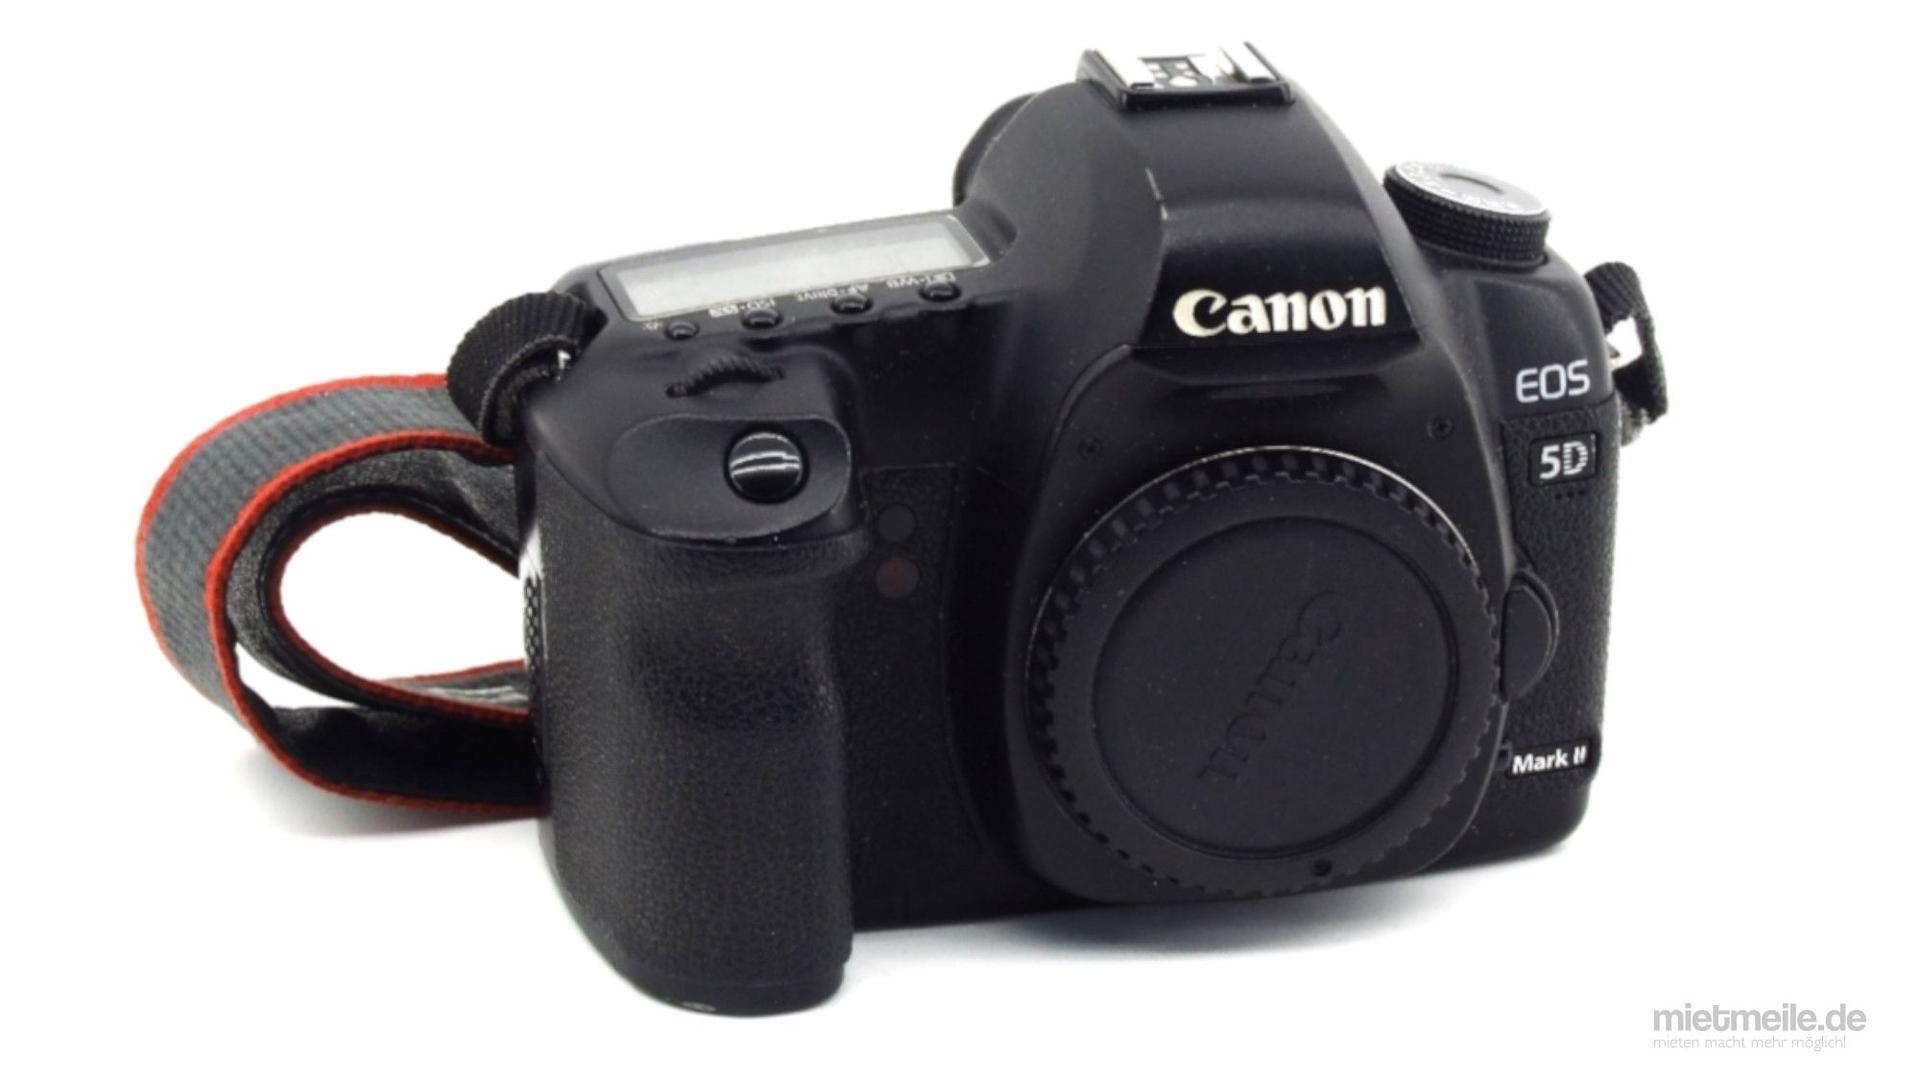 Fotokamera mieten & vermieten - Canon EOS 5D Mark II Spiegelreflex-Kamera DSLR Body in Schkeuditz